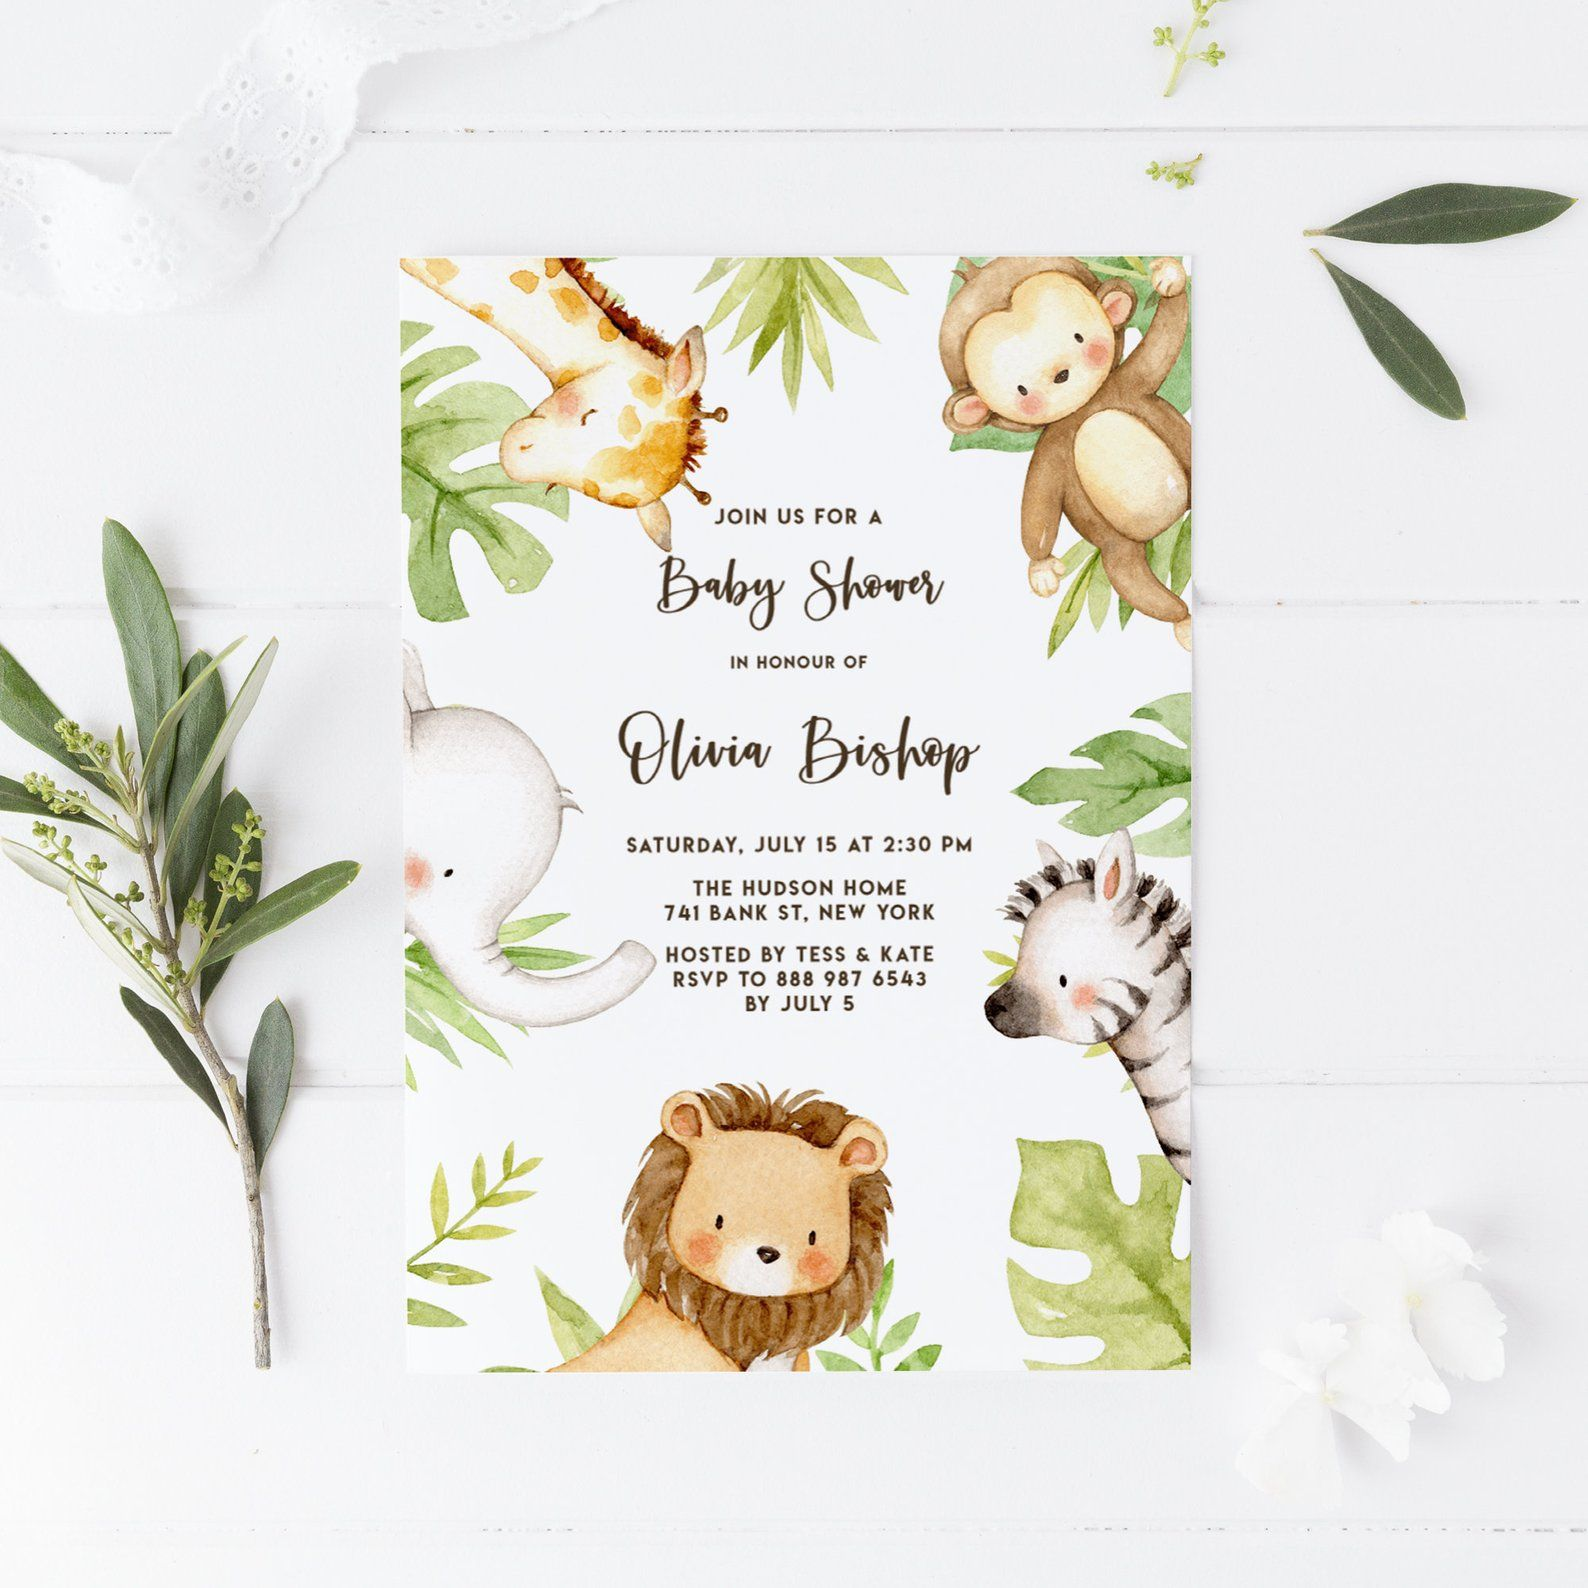 Printable Safari Baby Shower Invitation Template Editable Etsy Baby Shower Invitation Templates Safari Baby Shower Invitations Baby Shower Invitations